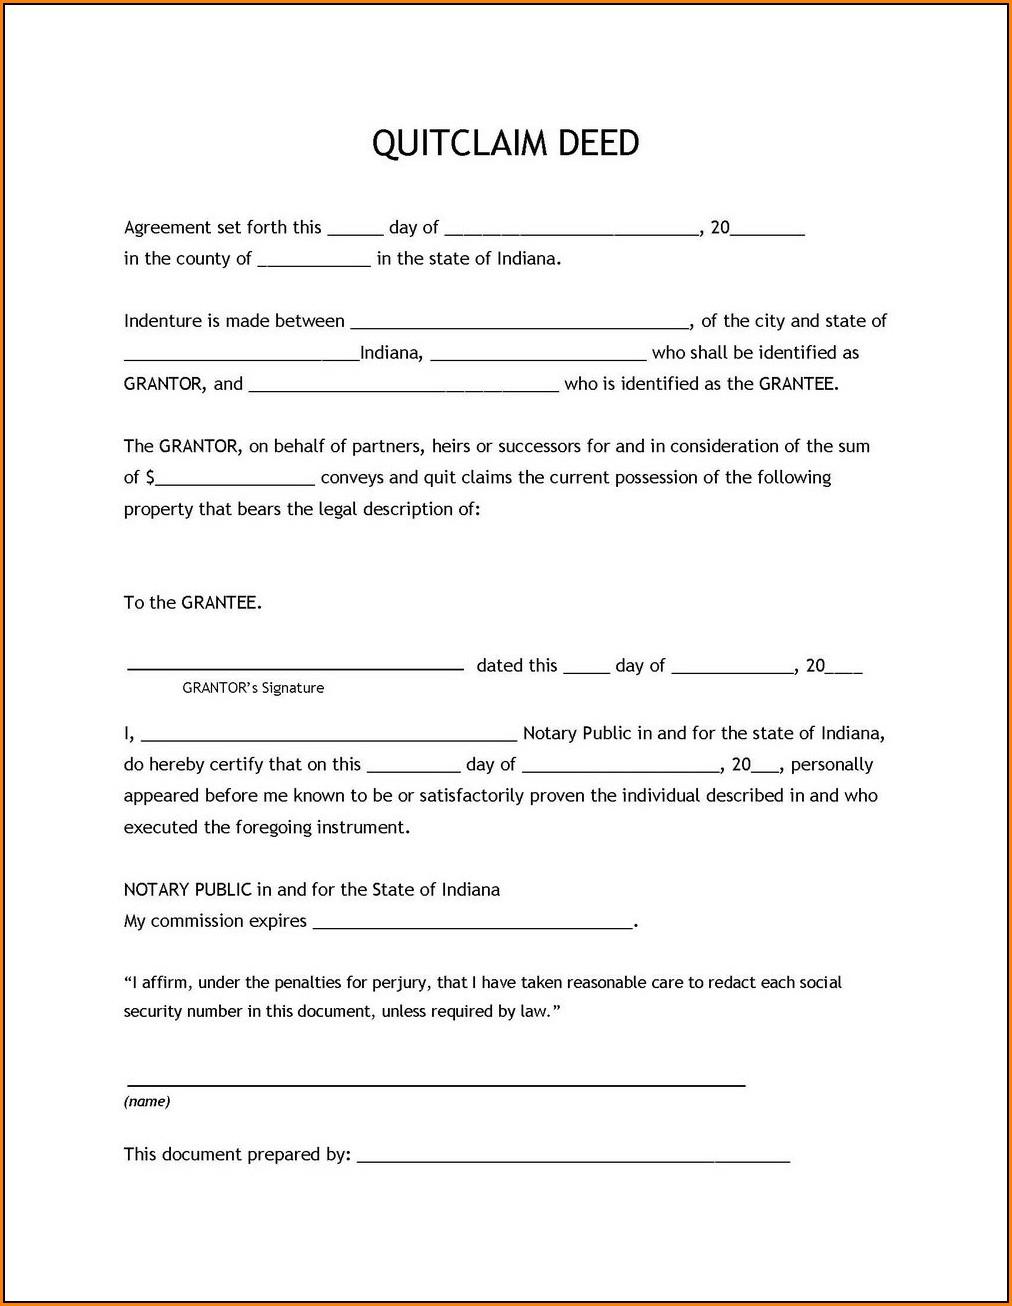 Quitclaim Deed Form Ct